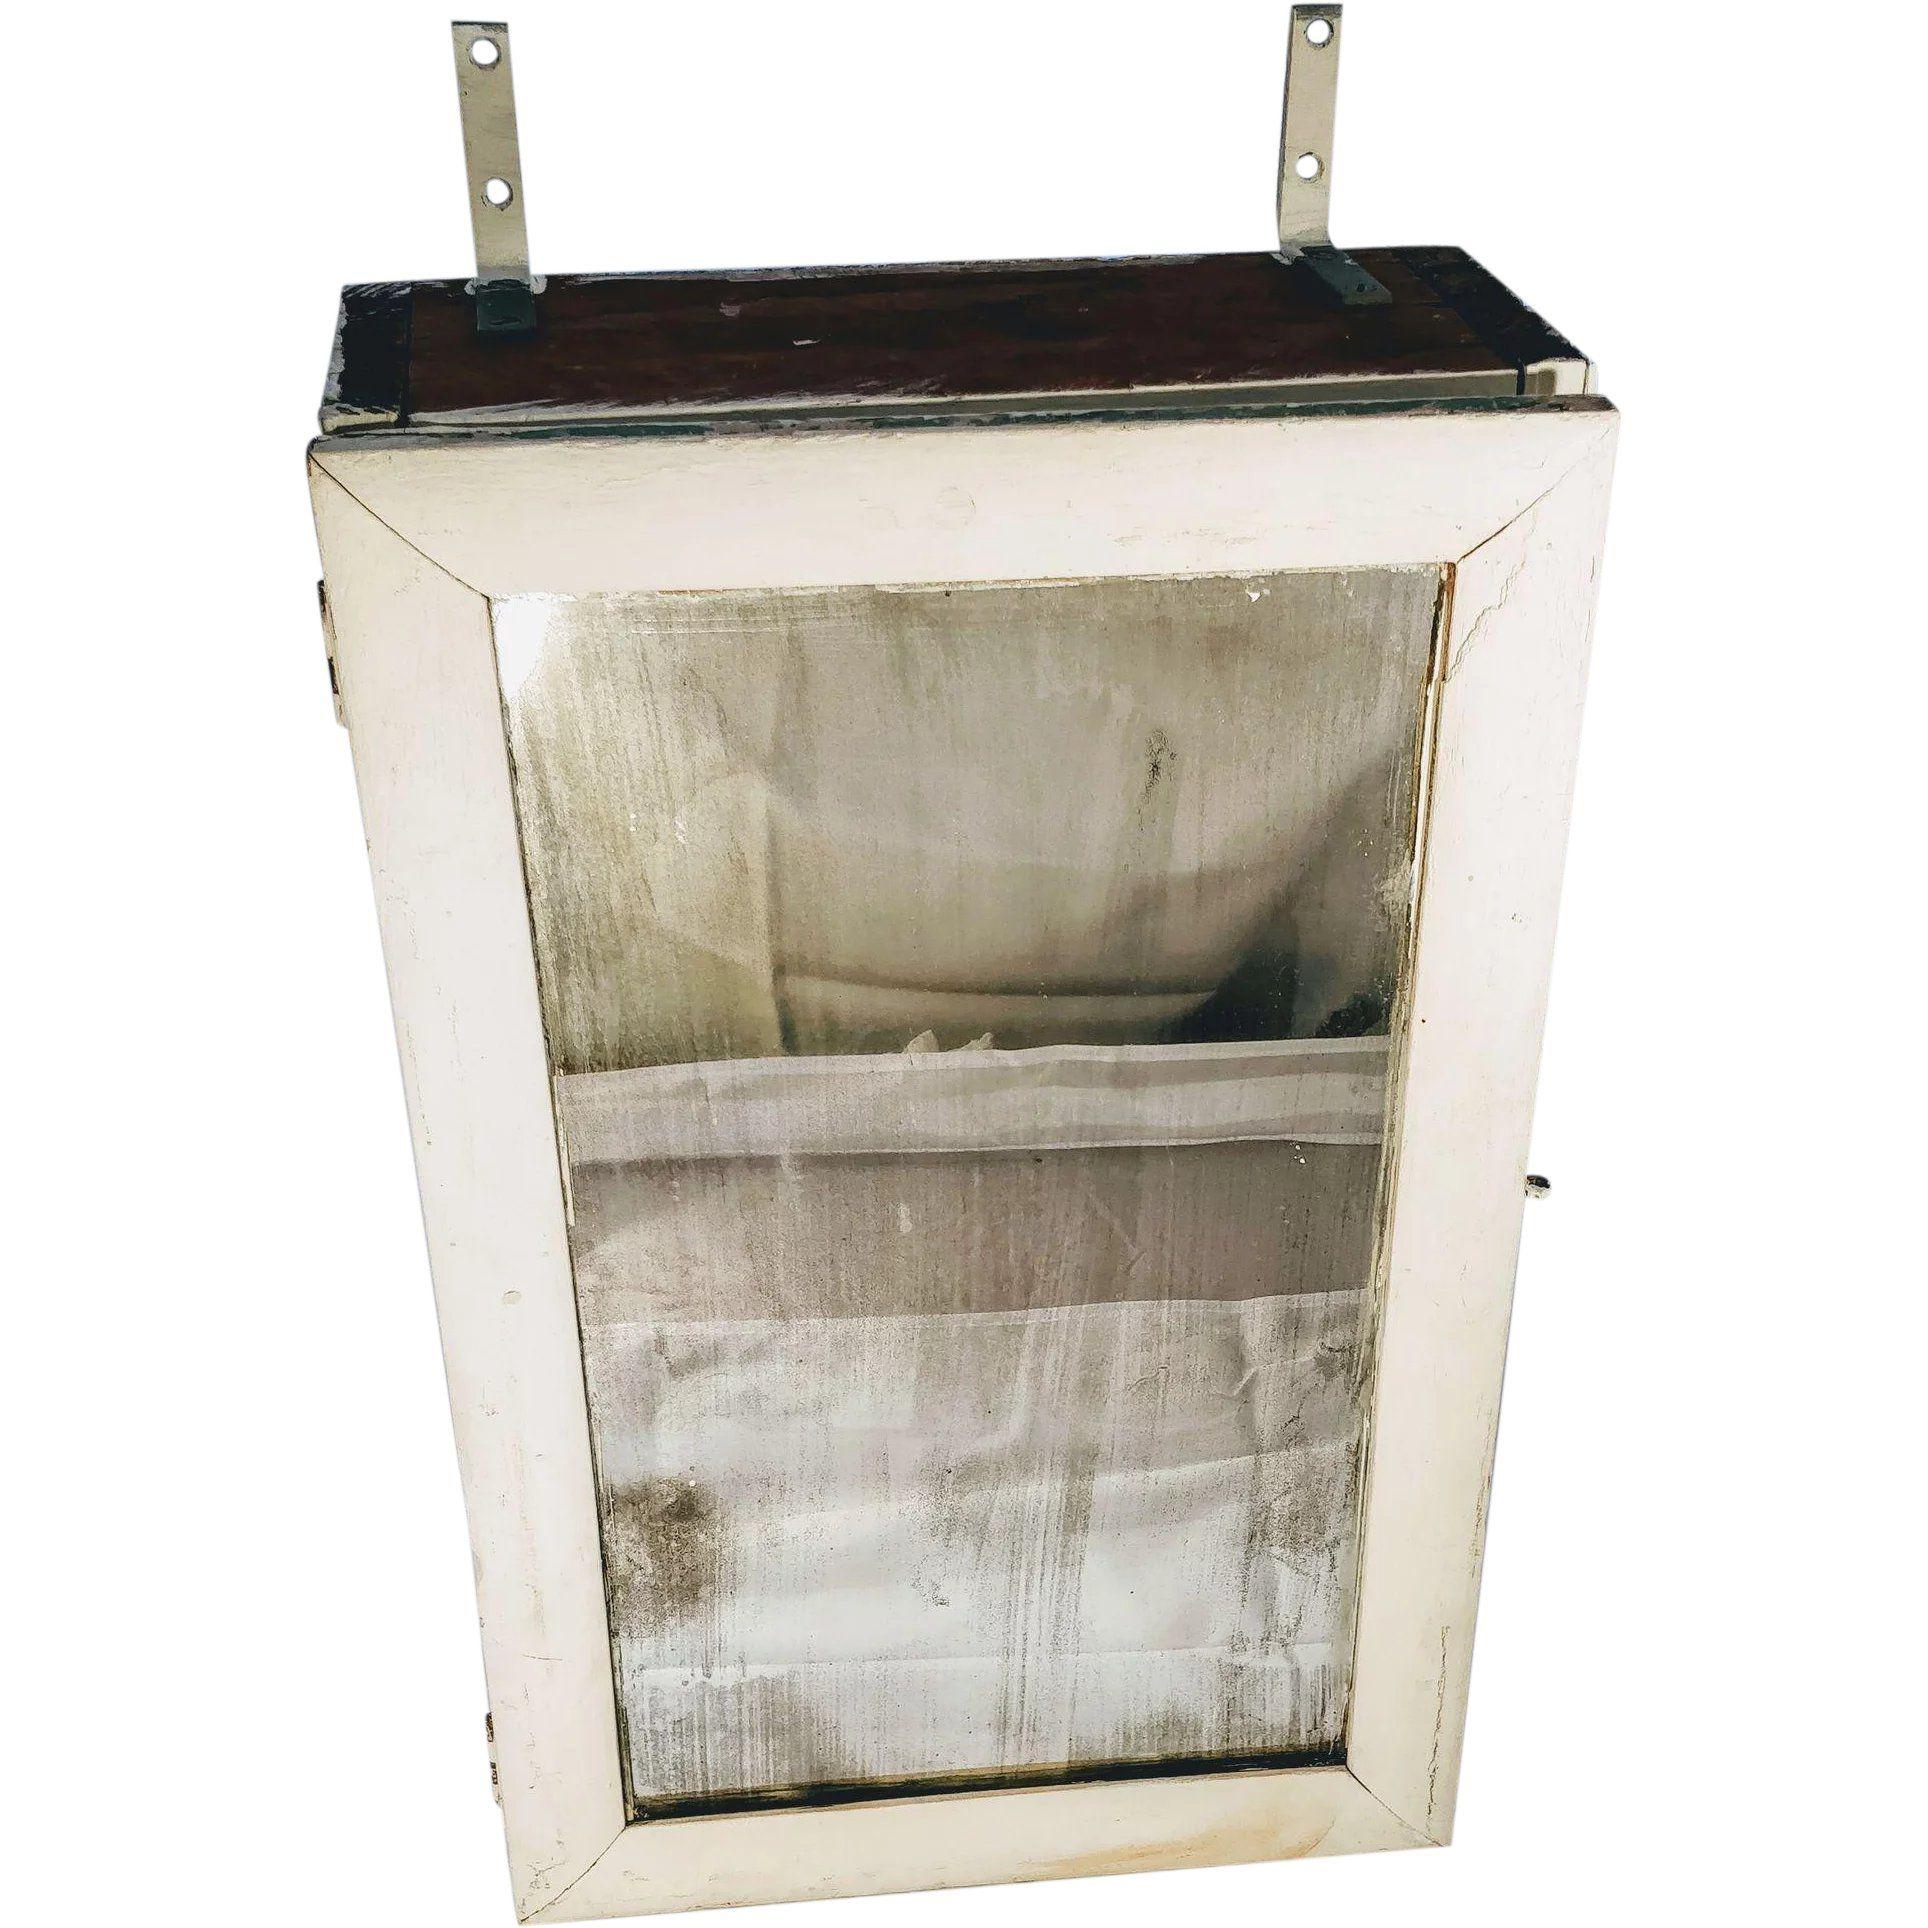 Vintage Medicine Cabinet Bathroom Mirror Wood Cupboard Old Shabby Chic Chippy Wall Mount Shelf Farmhouse Vintage Medicine Cabinets Wood Cupboard Vintage House [ 1928 x 1928 Pixel ]